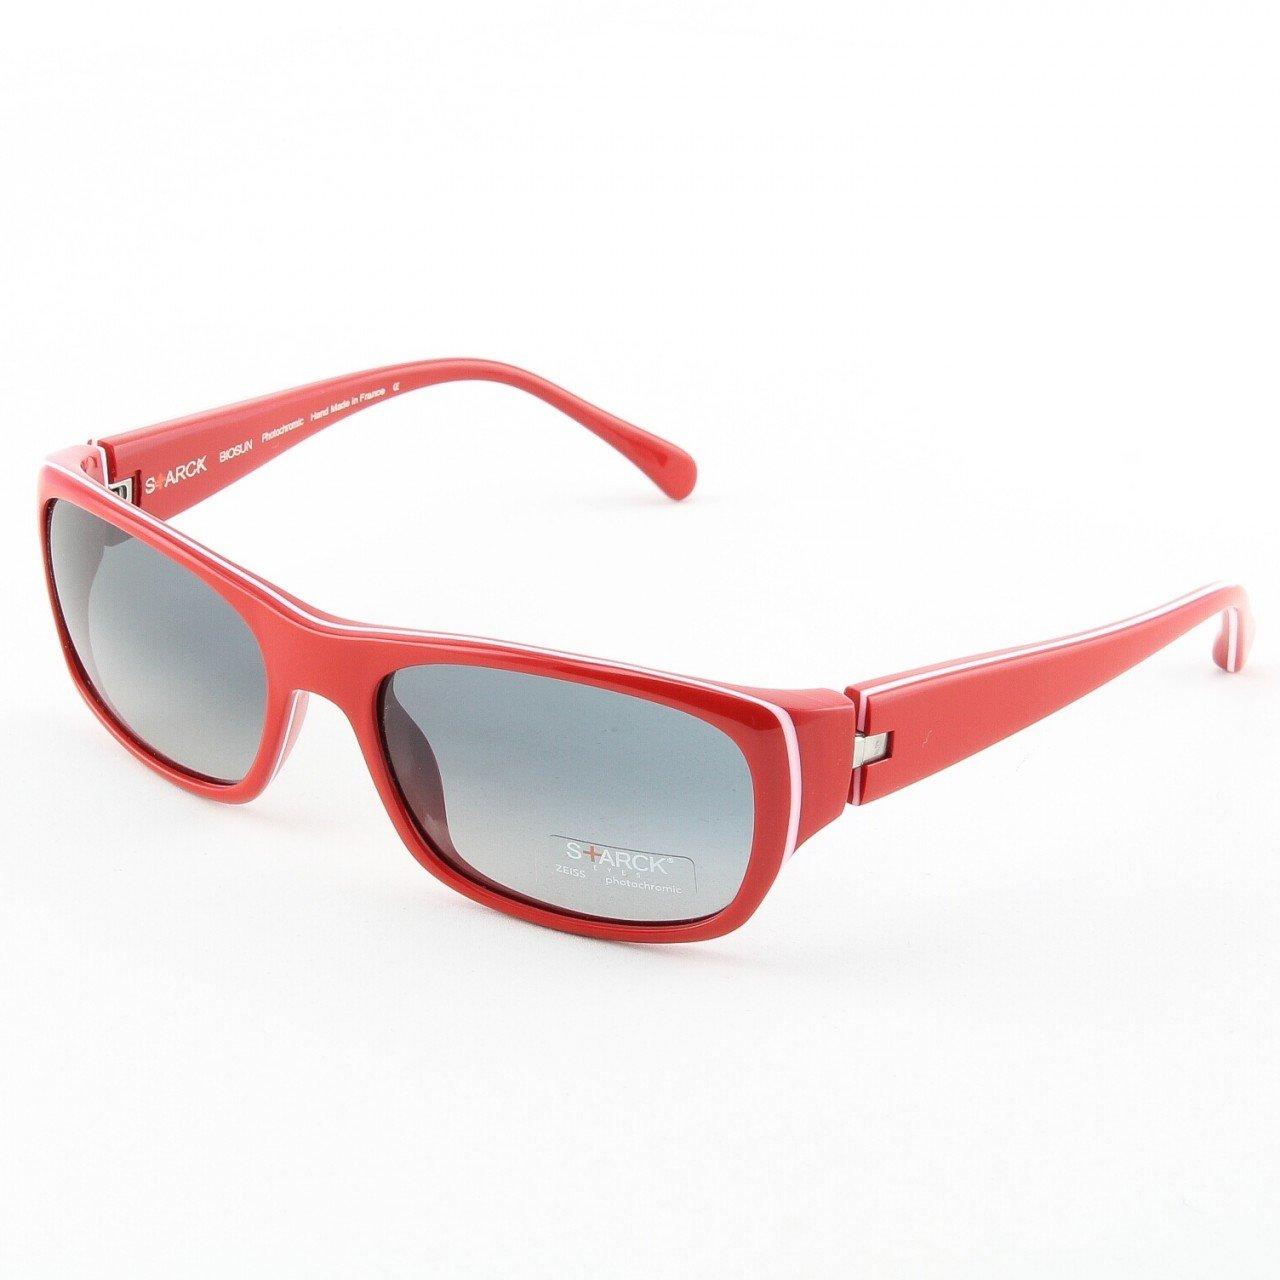 Starck Sunglasses P0650 Col. 27 U4 Red, White Stripe with Black Gradient Photochromic Lenses